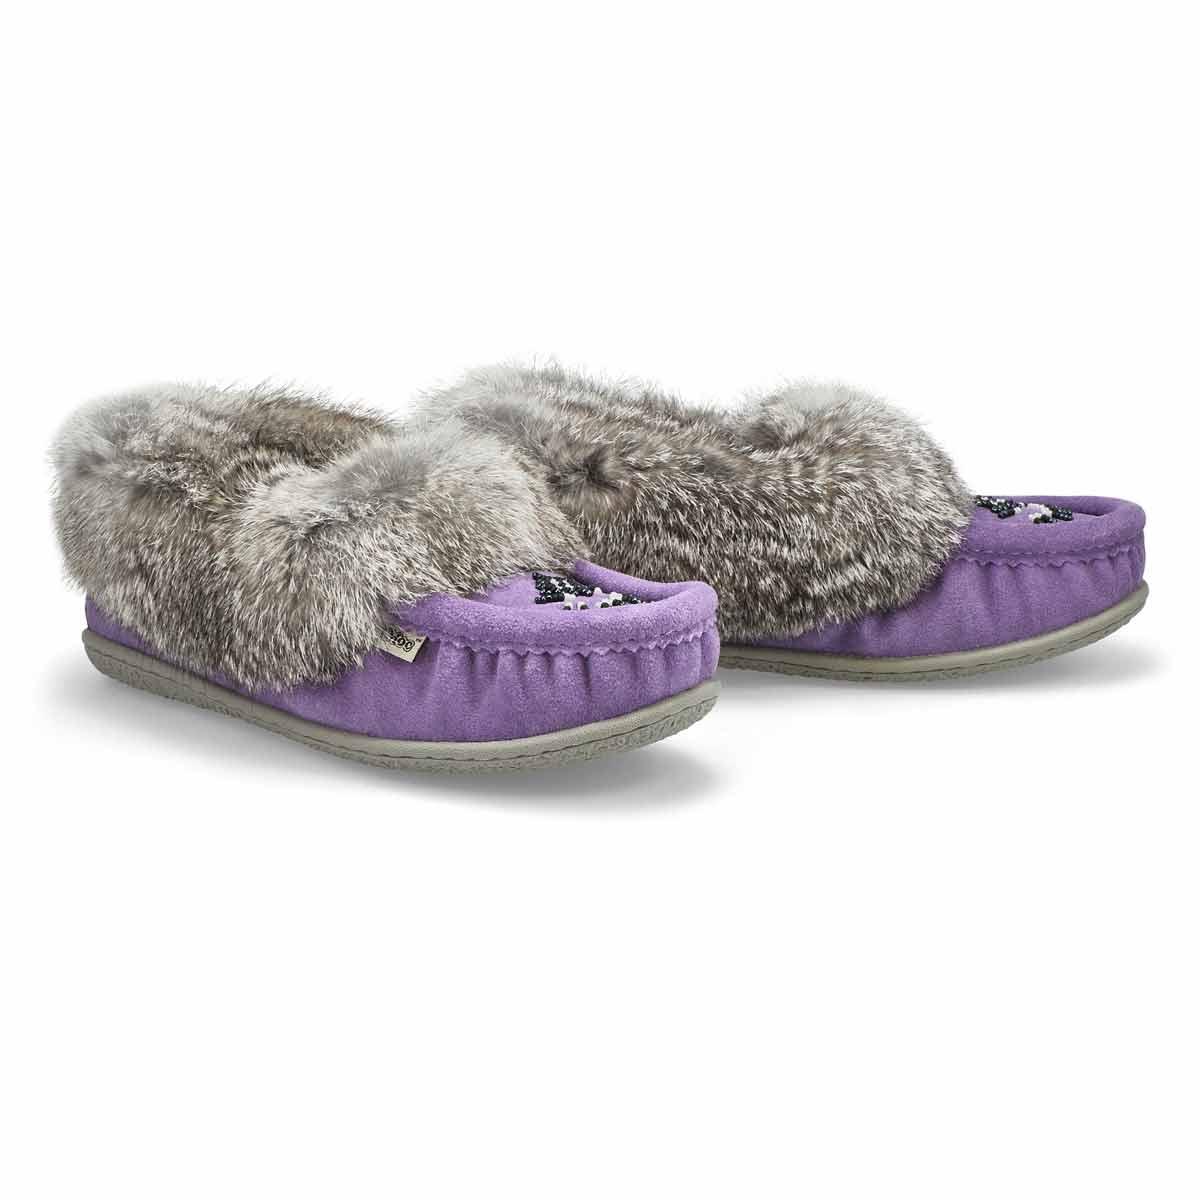 Women's Cute 5 Rabbit Fur Moccasin - Lavender